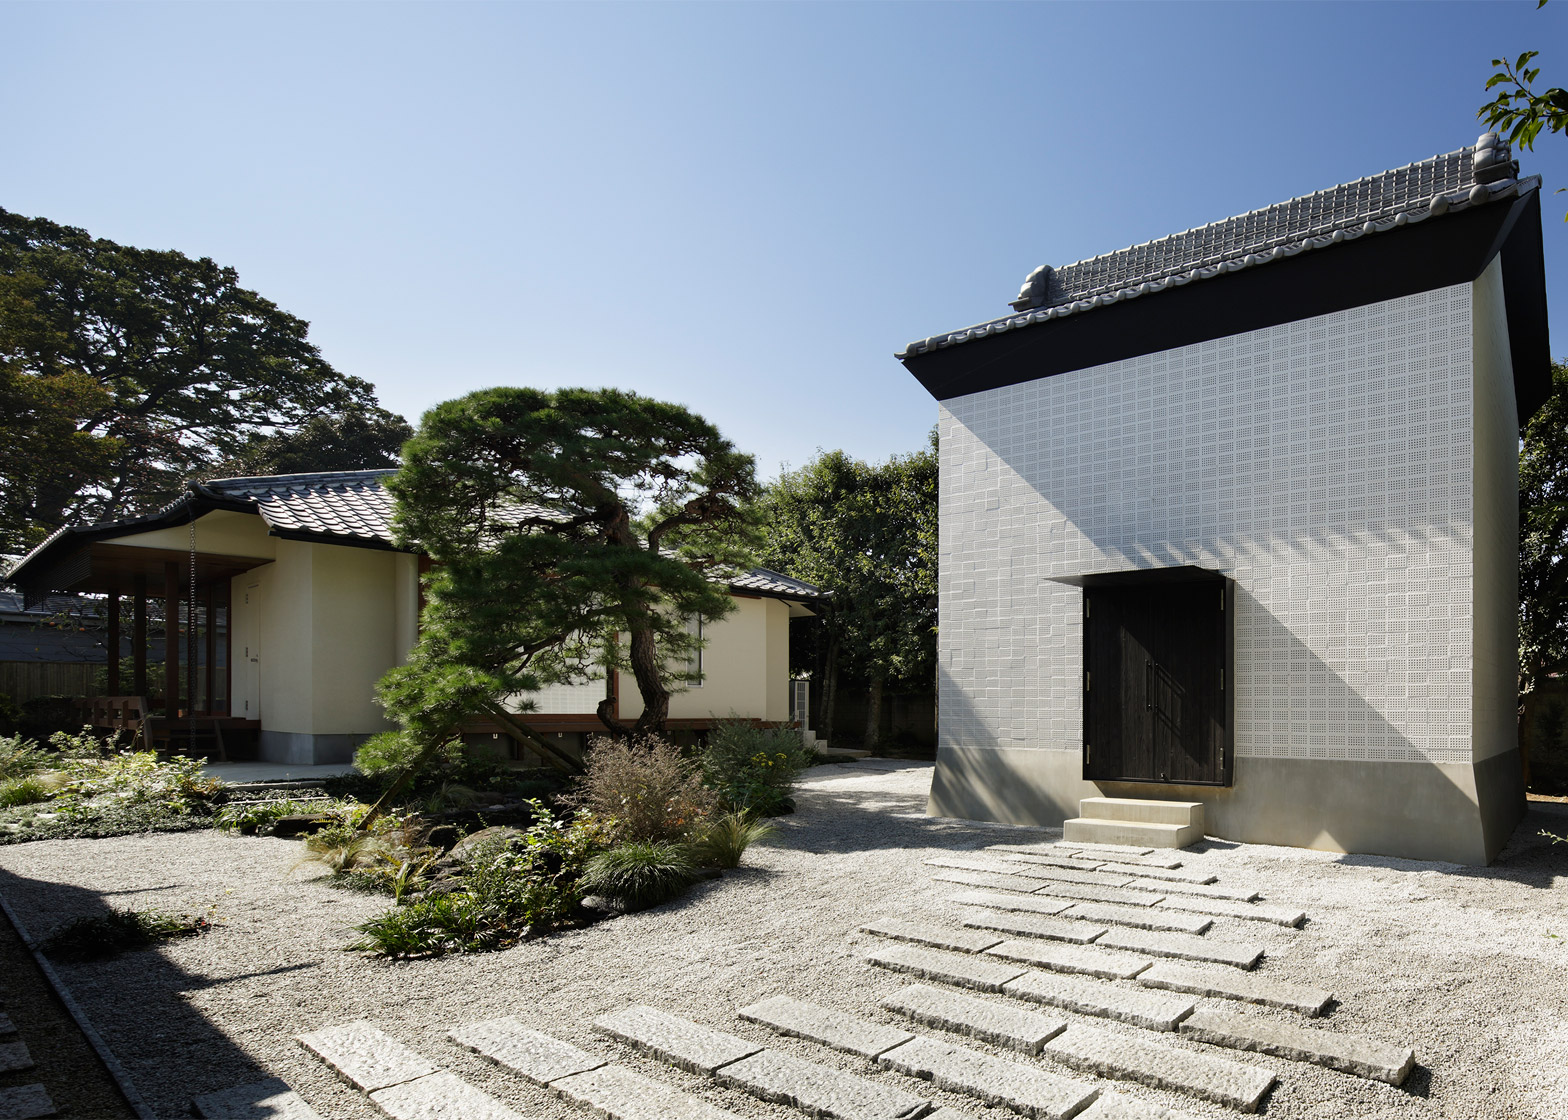 The Rebirth House in Ibaraki by Ryo Matsui